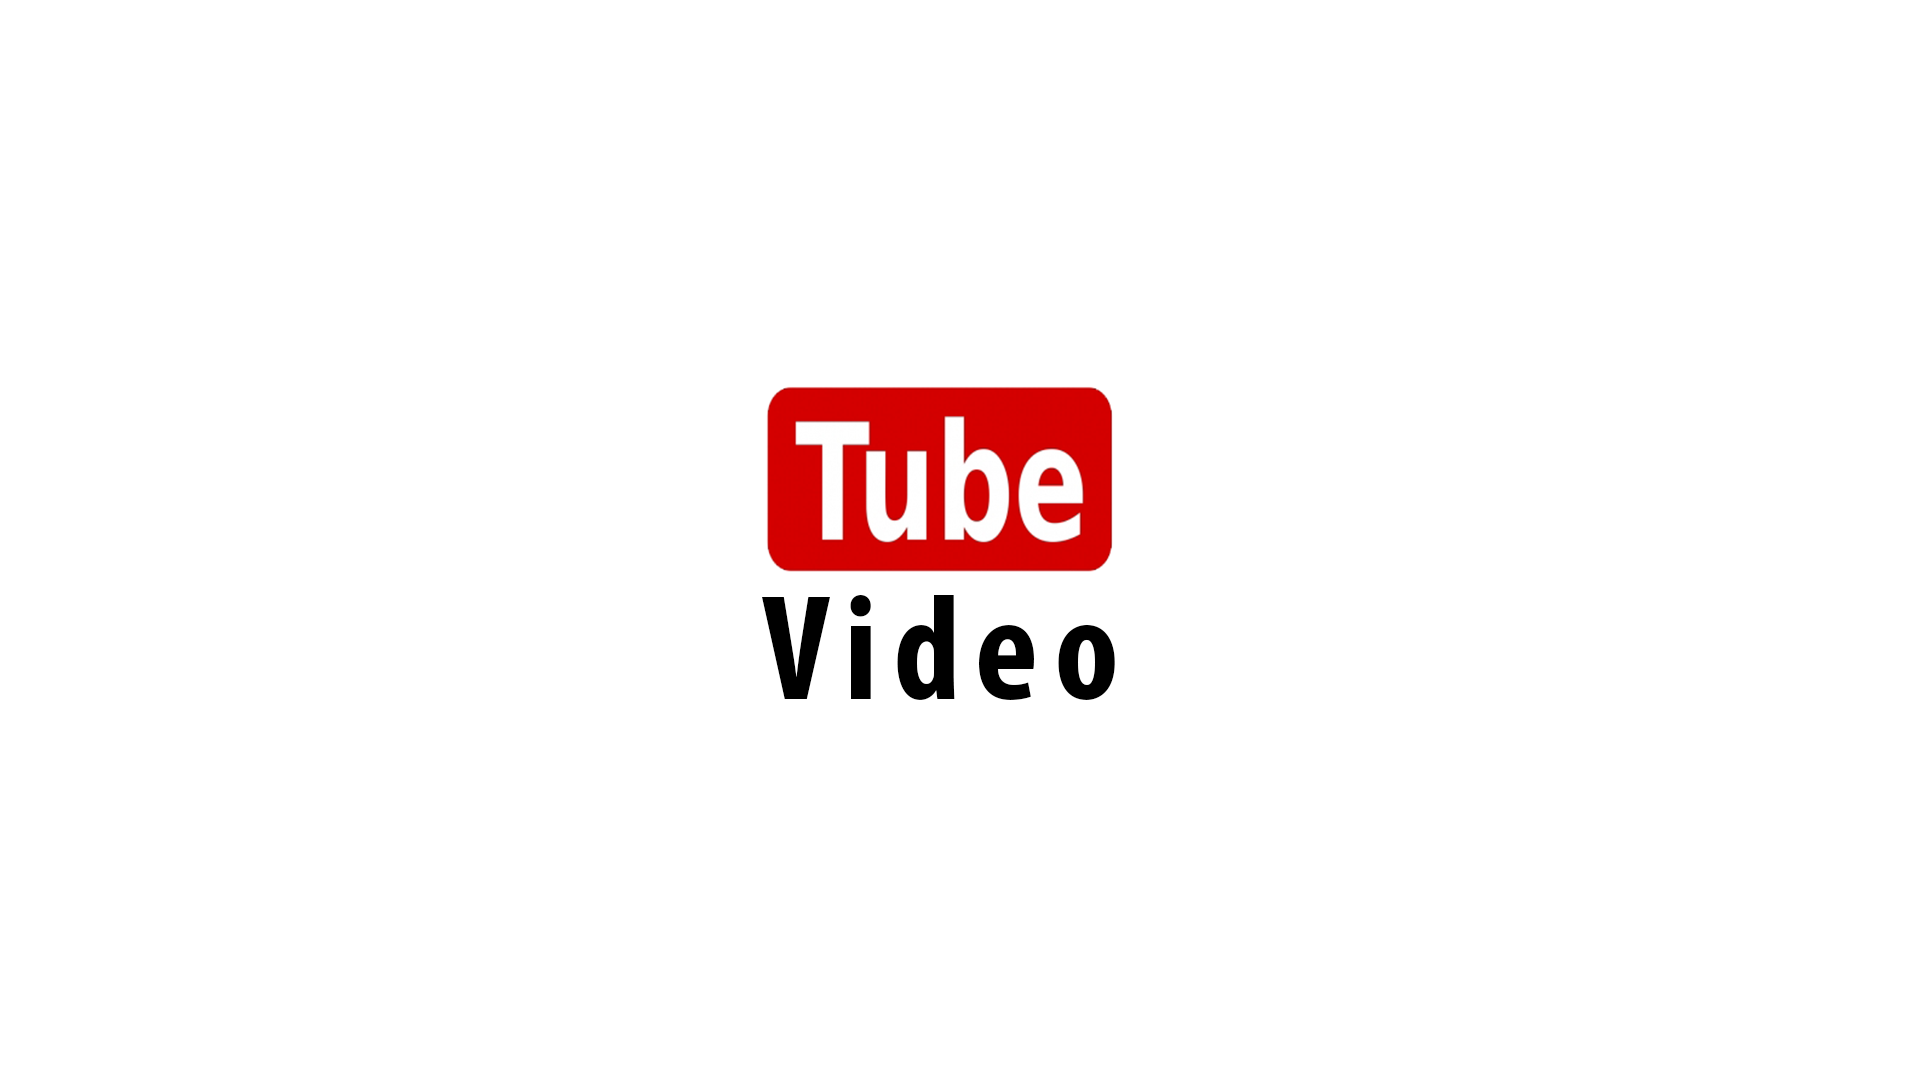 Xxx mladi video com